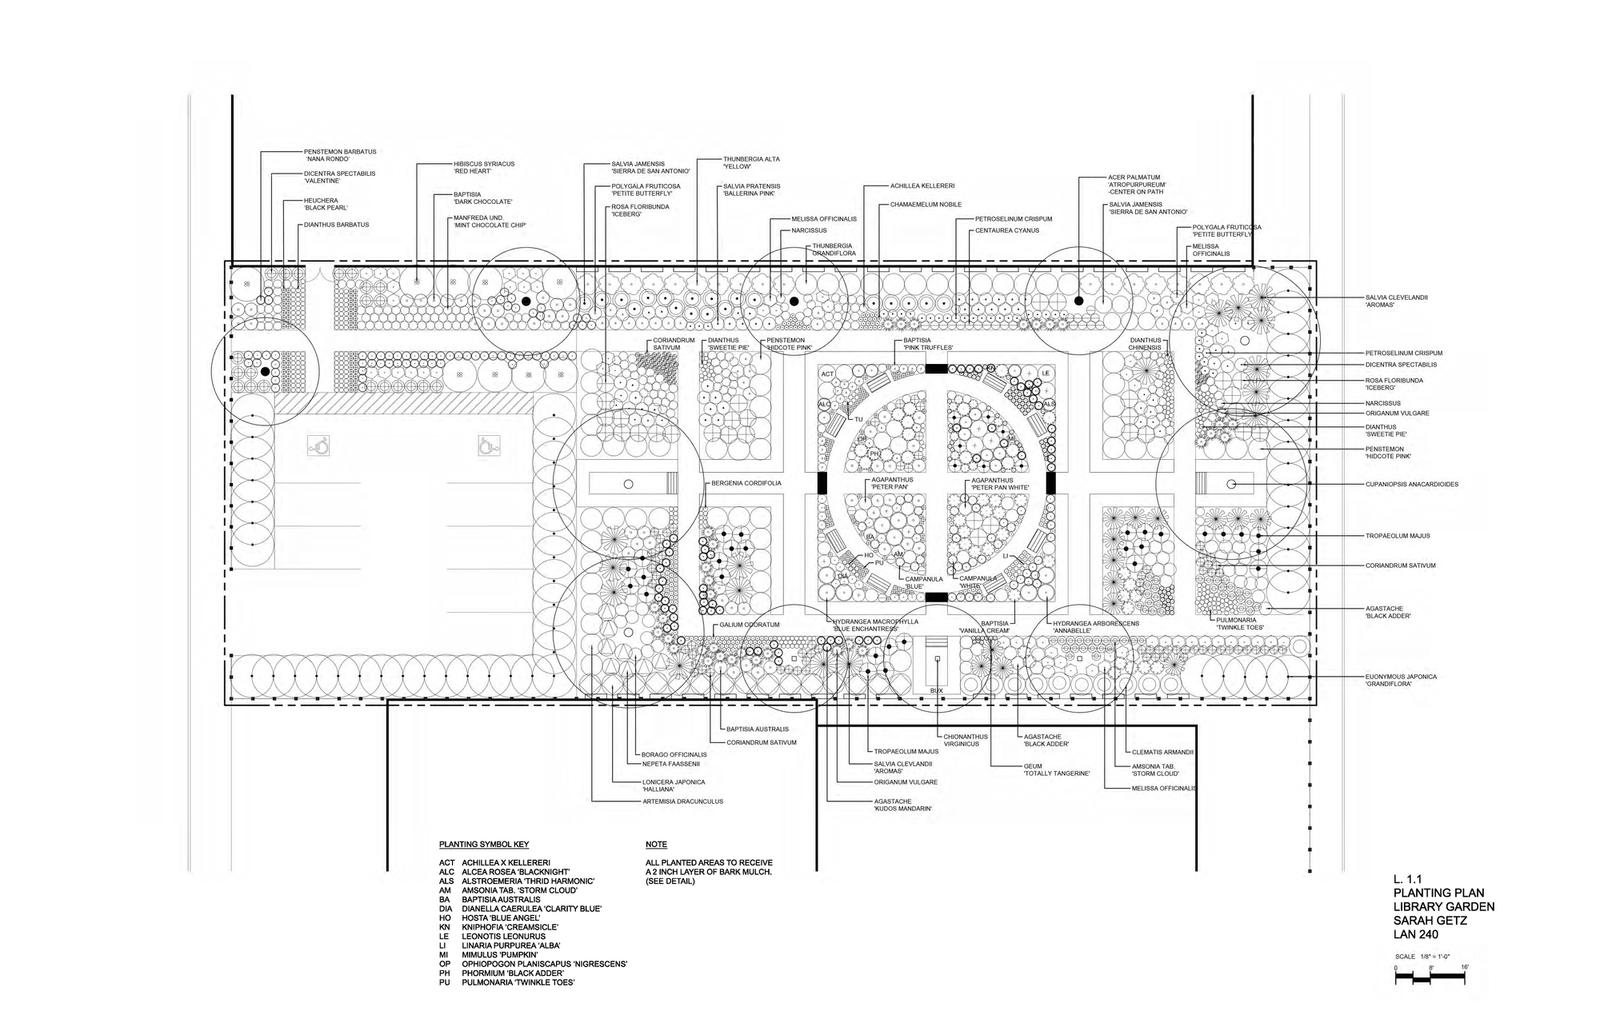 Library Garden for 601 Brannan Street Site 24